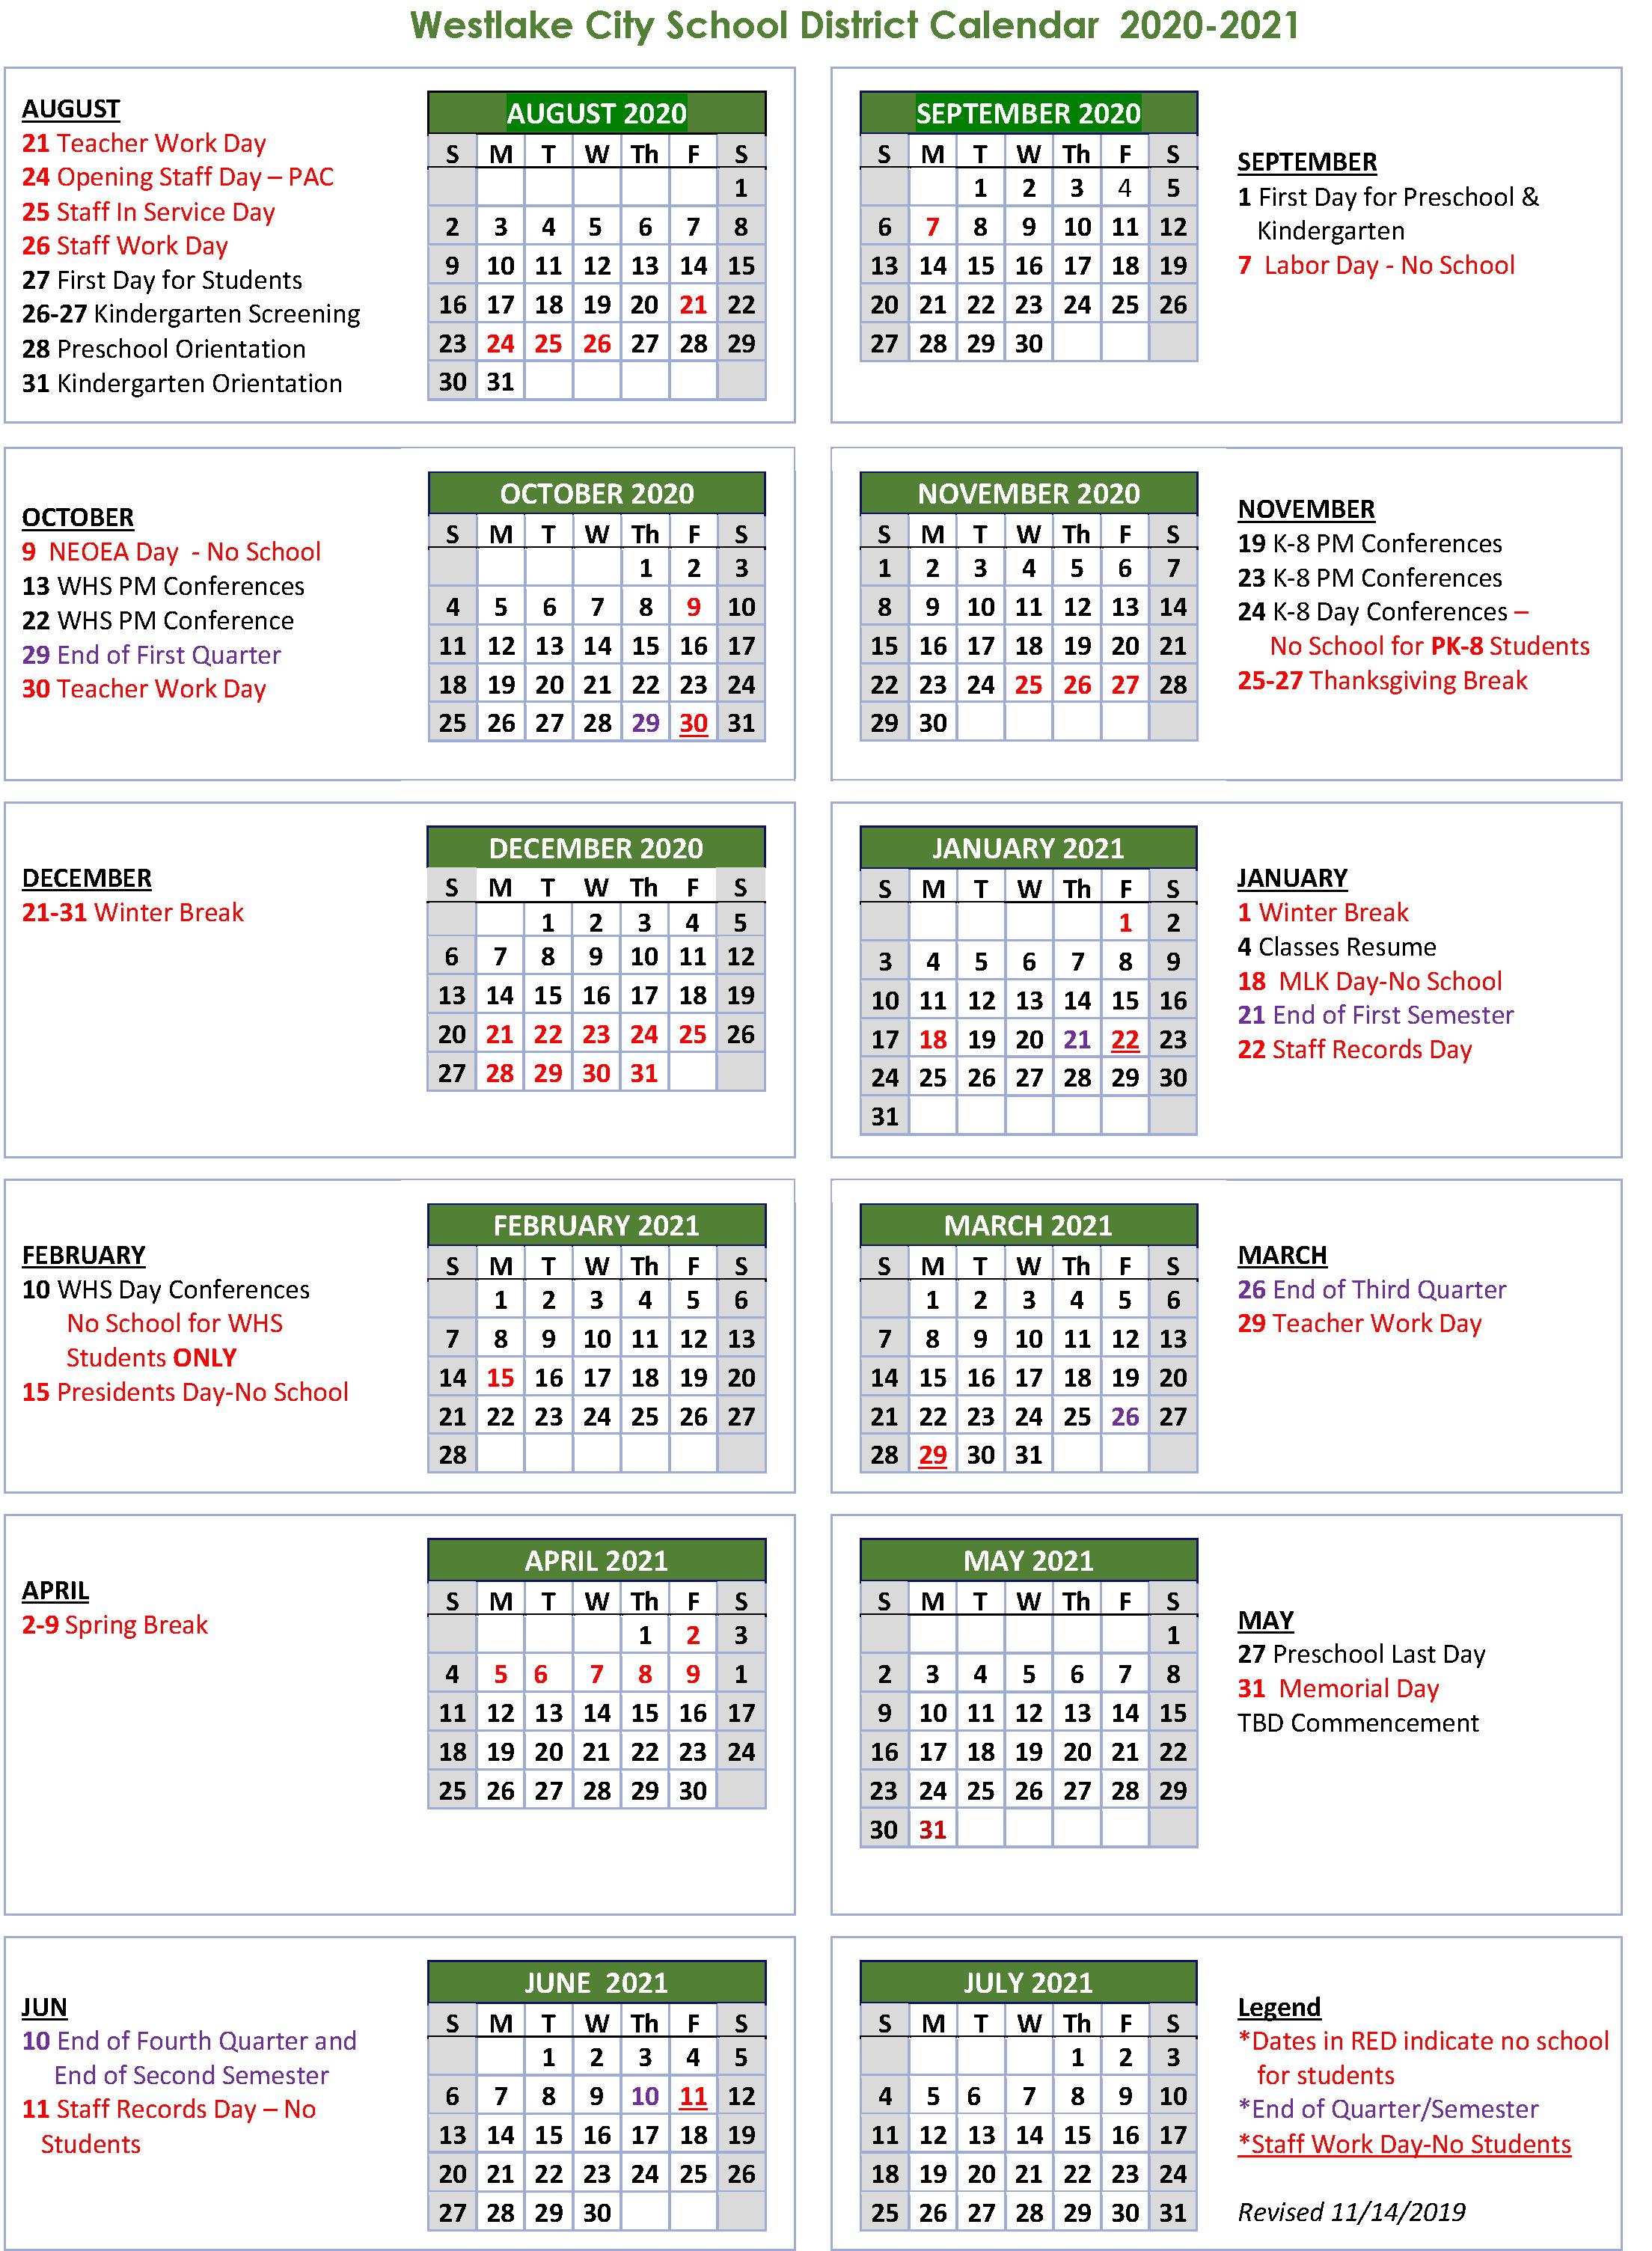 School Calendar - Westlake City School District